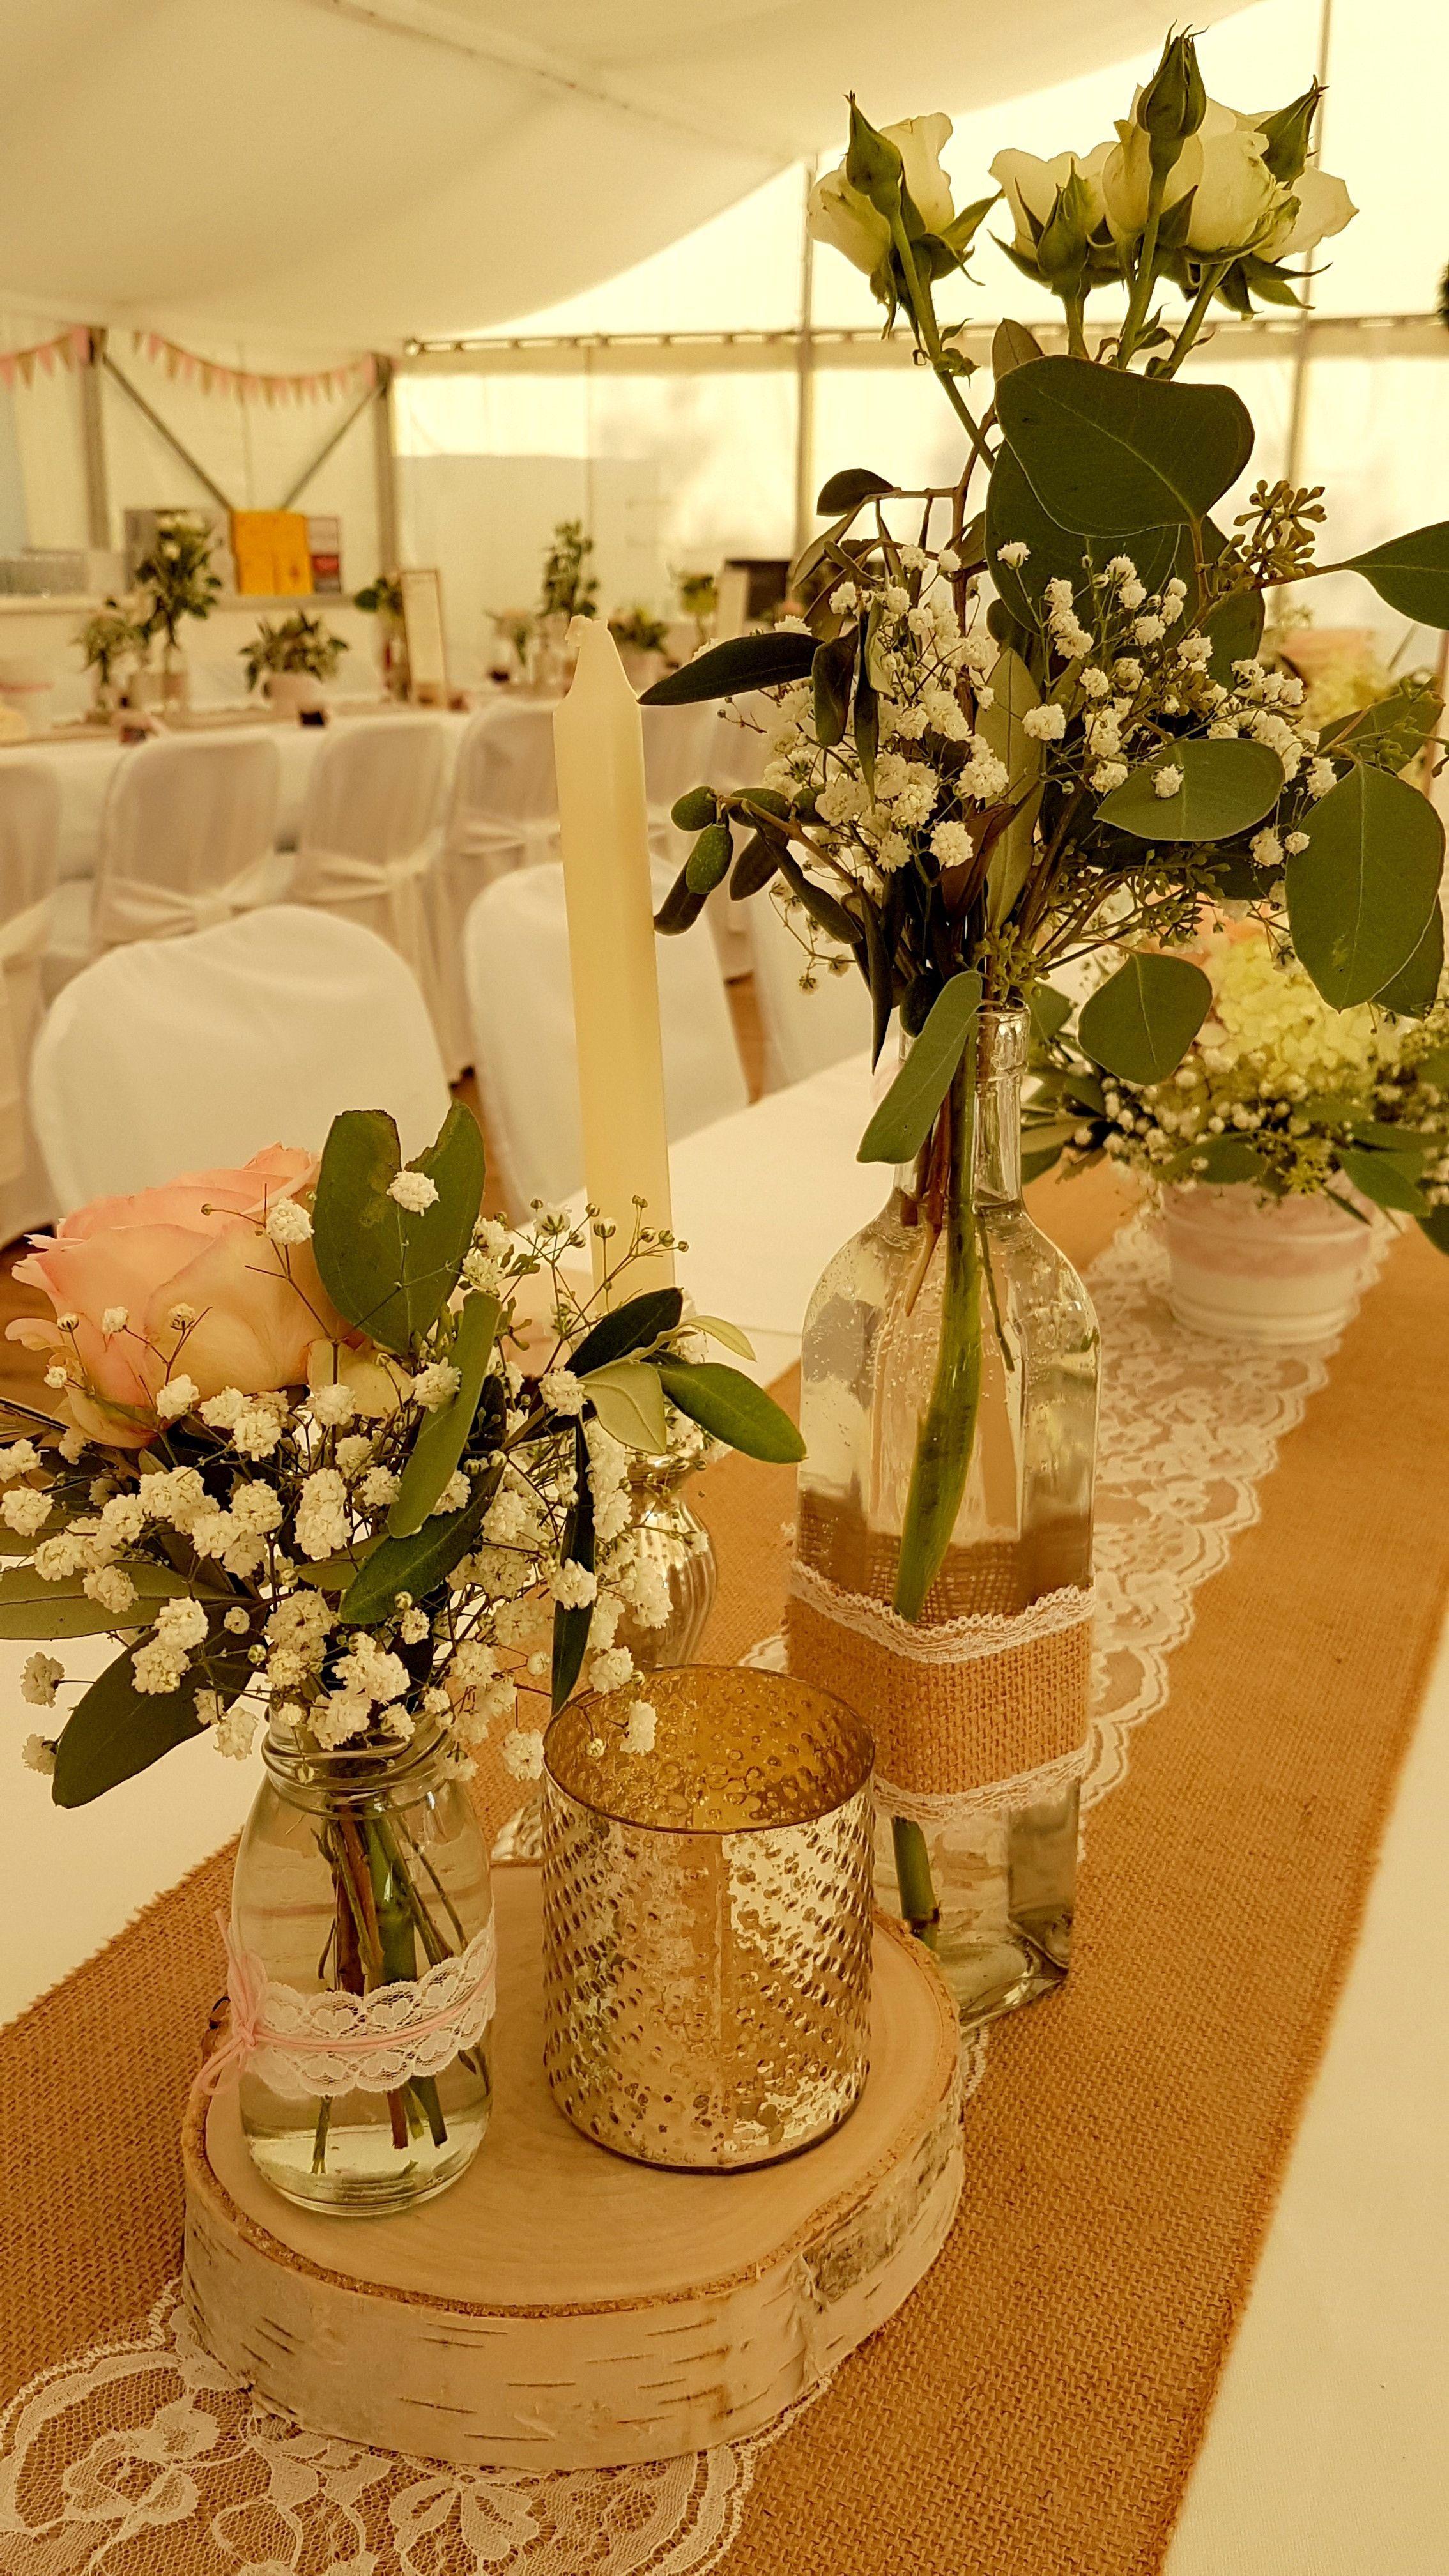 Wedding Wedding Table Table Decoration Heart Peasant Silver Rose White Ju Wedding In 2020 Hochzeit Tisch Ideen Dekoration Hochzeit Hochzeitsdeko